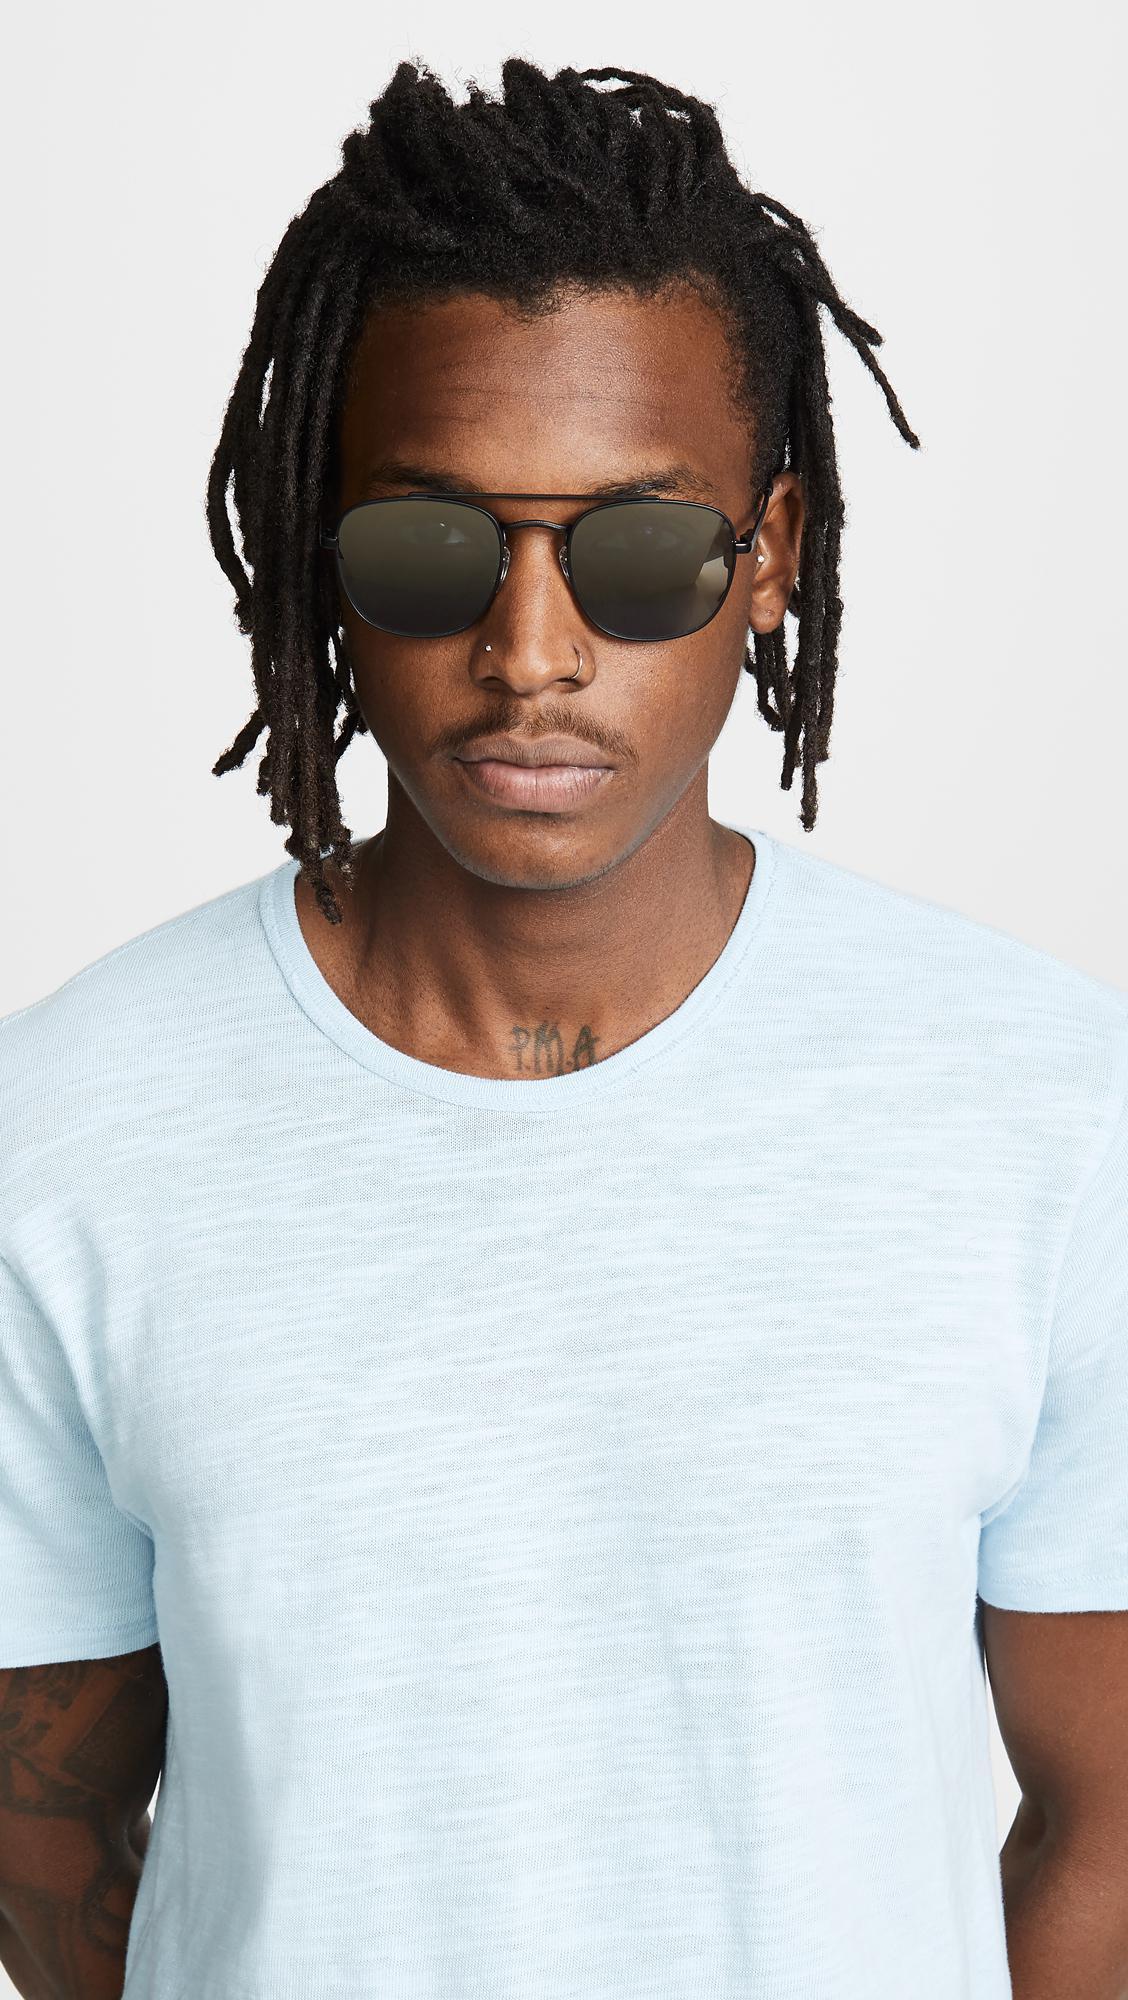 f3a66bb3a1 Le Specs - Multicolor Harlem Hustler Sunglasses for Men - Lyst. View  fullscreen